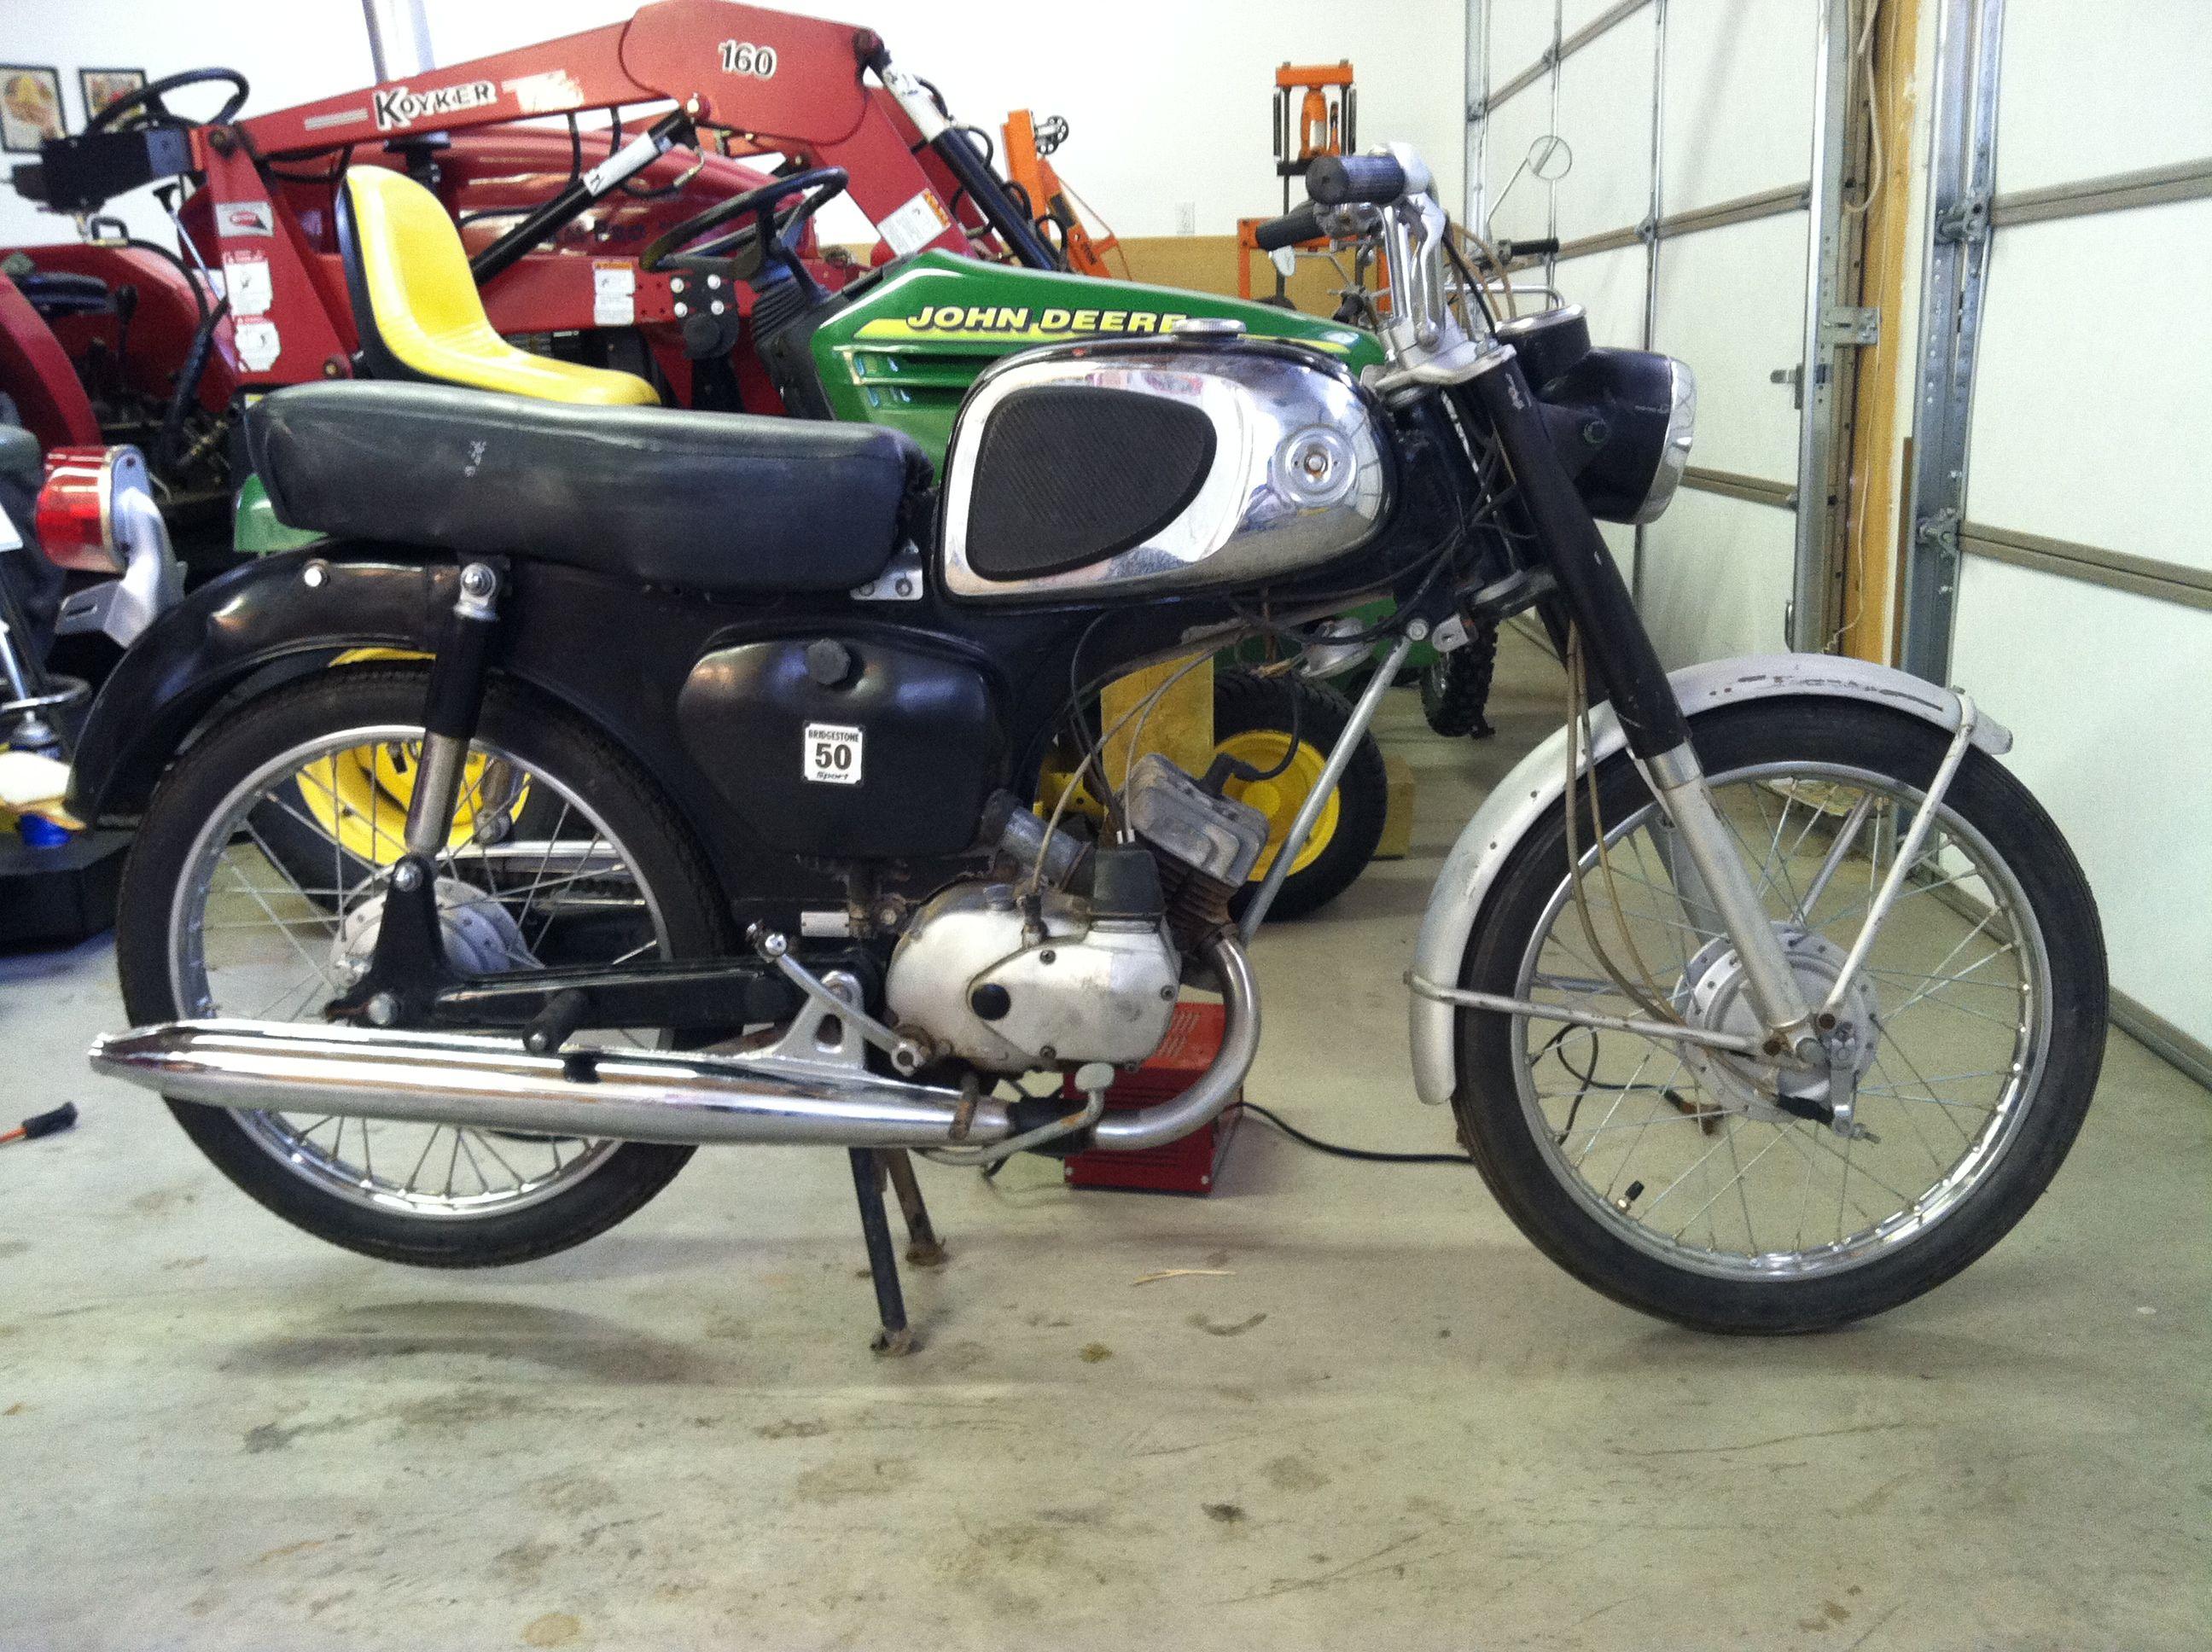 1966 Bridgestone Sport 50 w/ Honda C110 tank temporarily